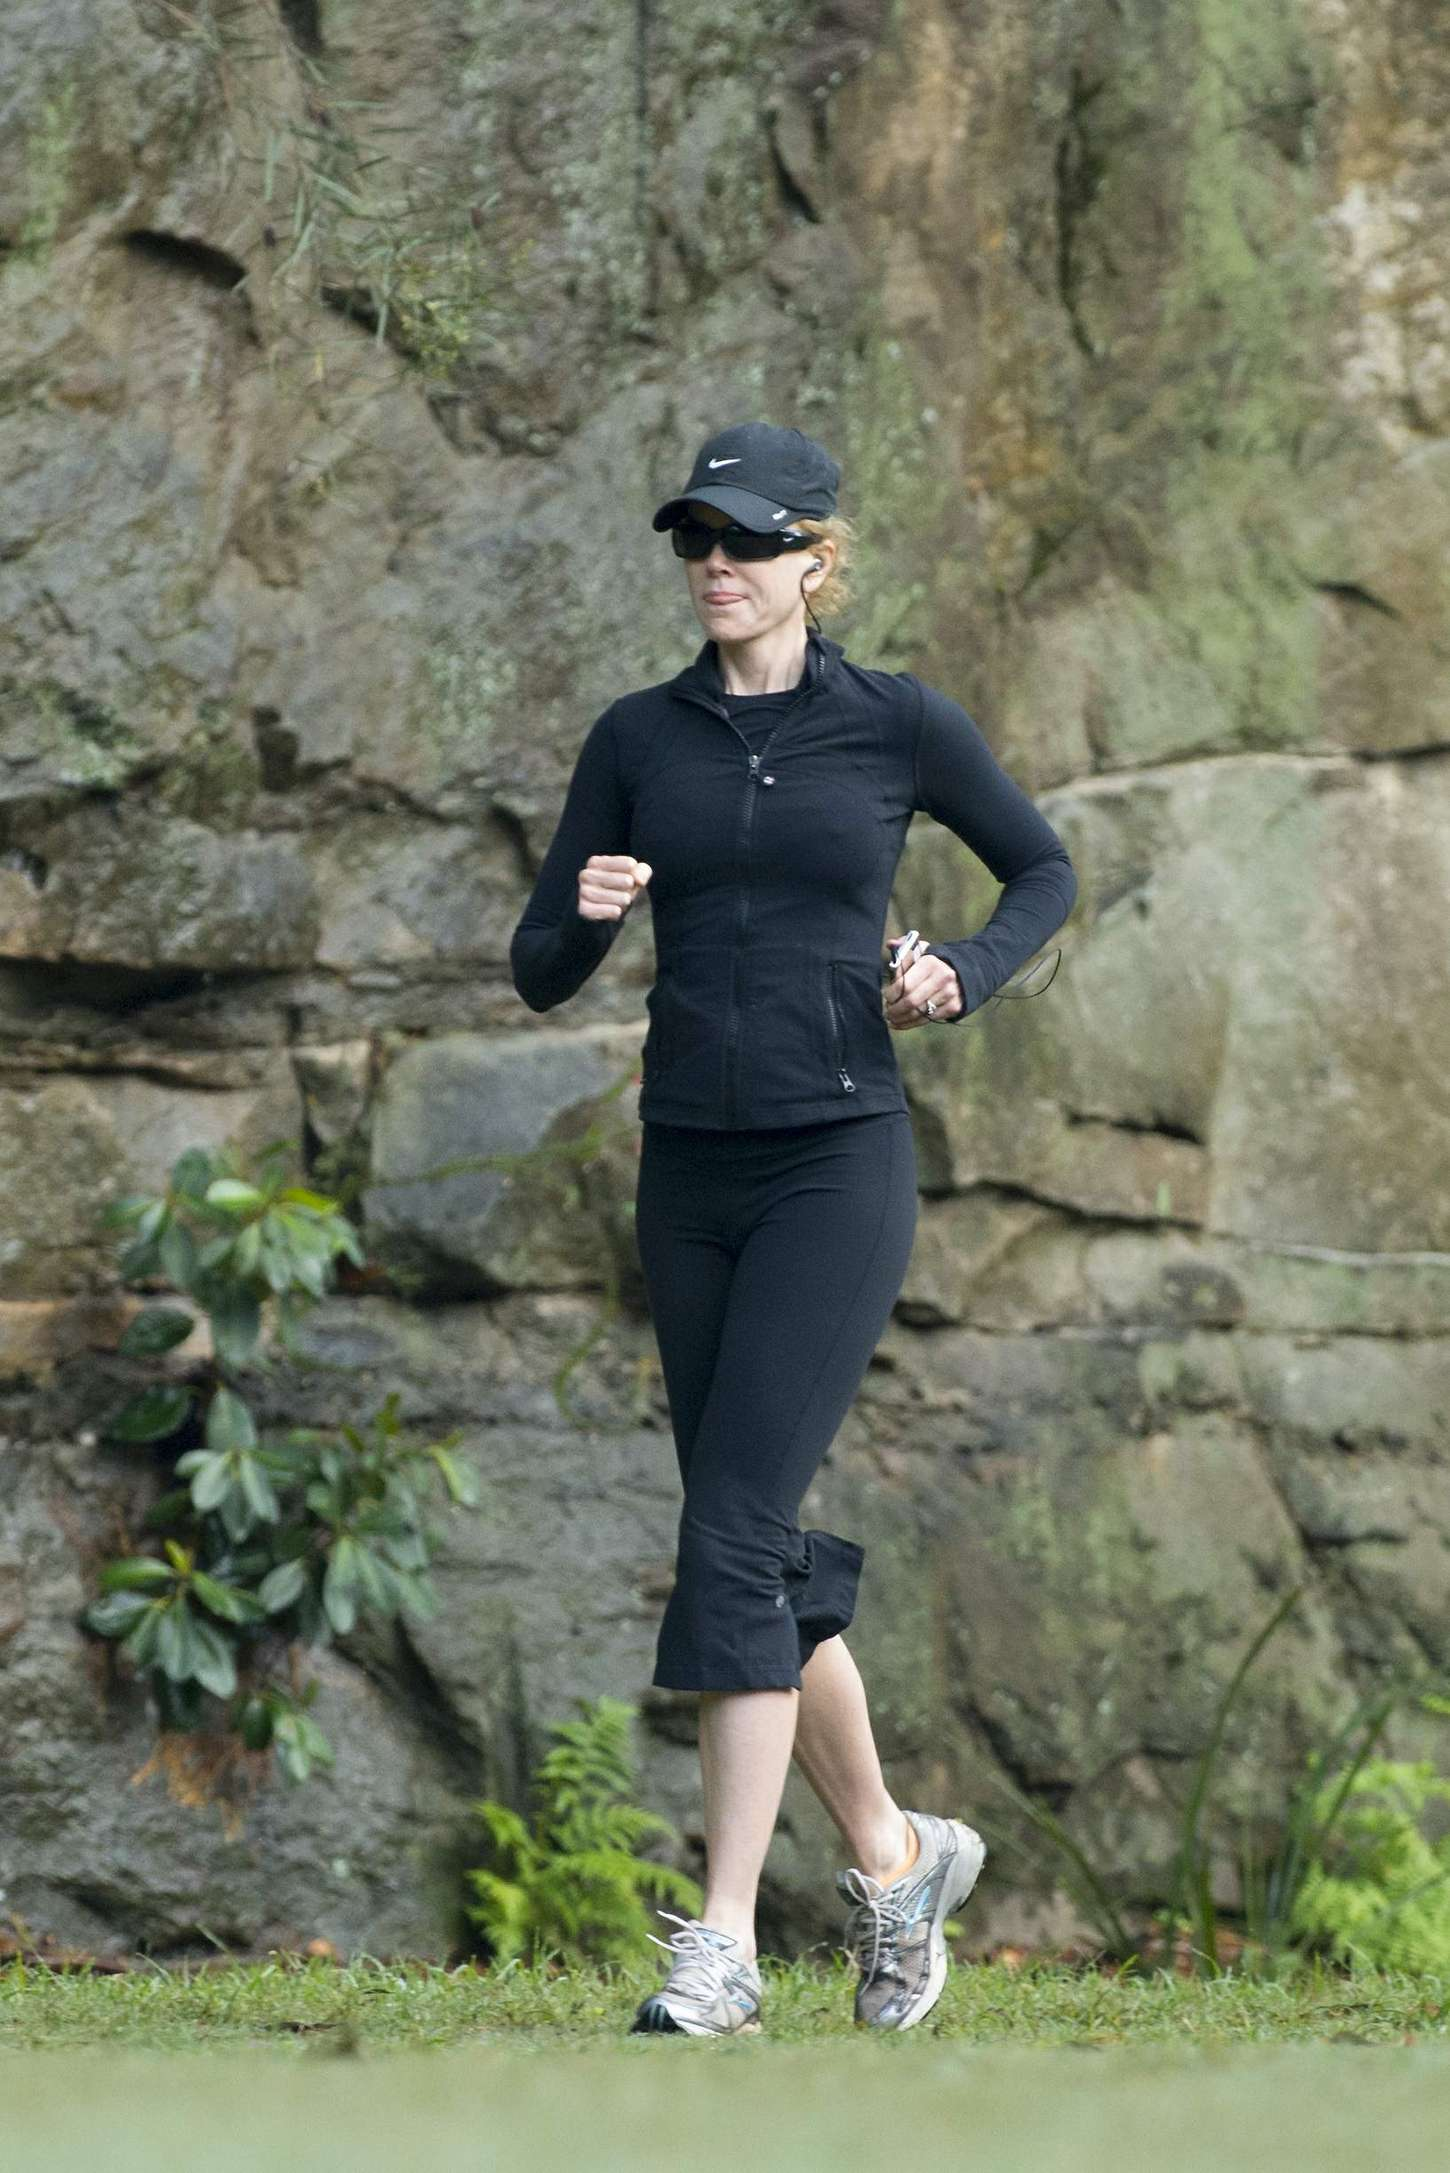 Nicole Kidman Jogging In Sydney Gotceleb